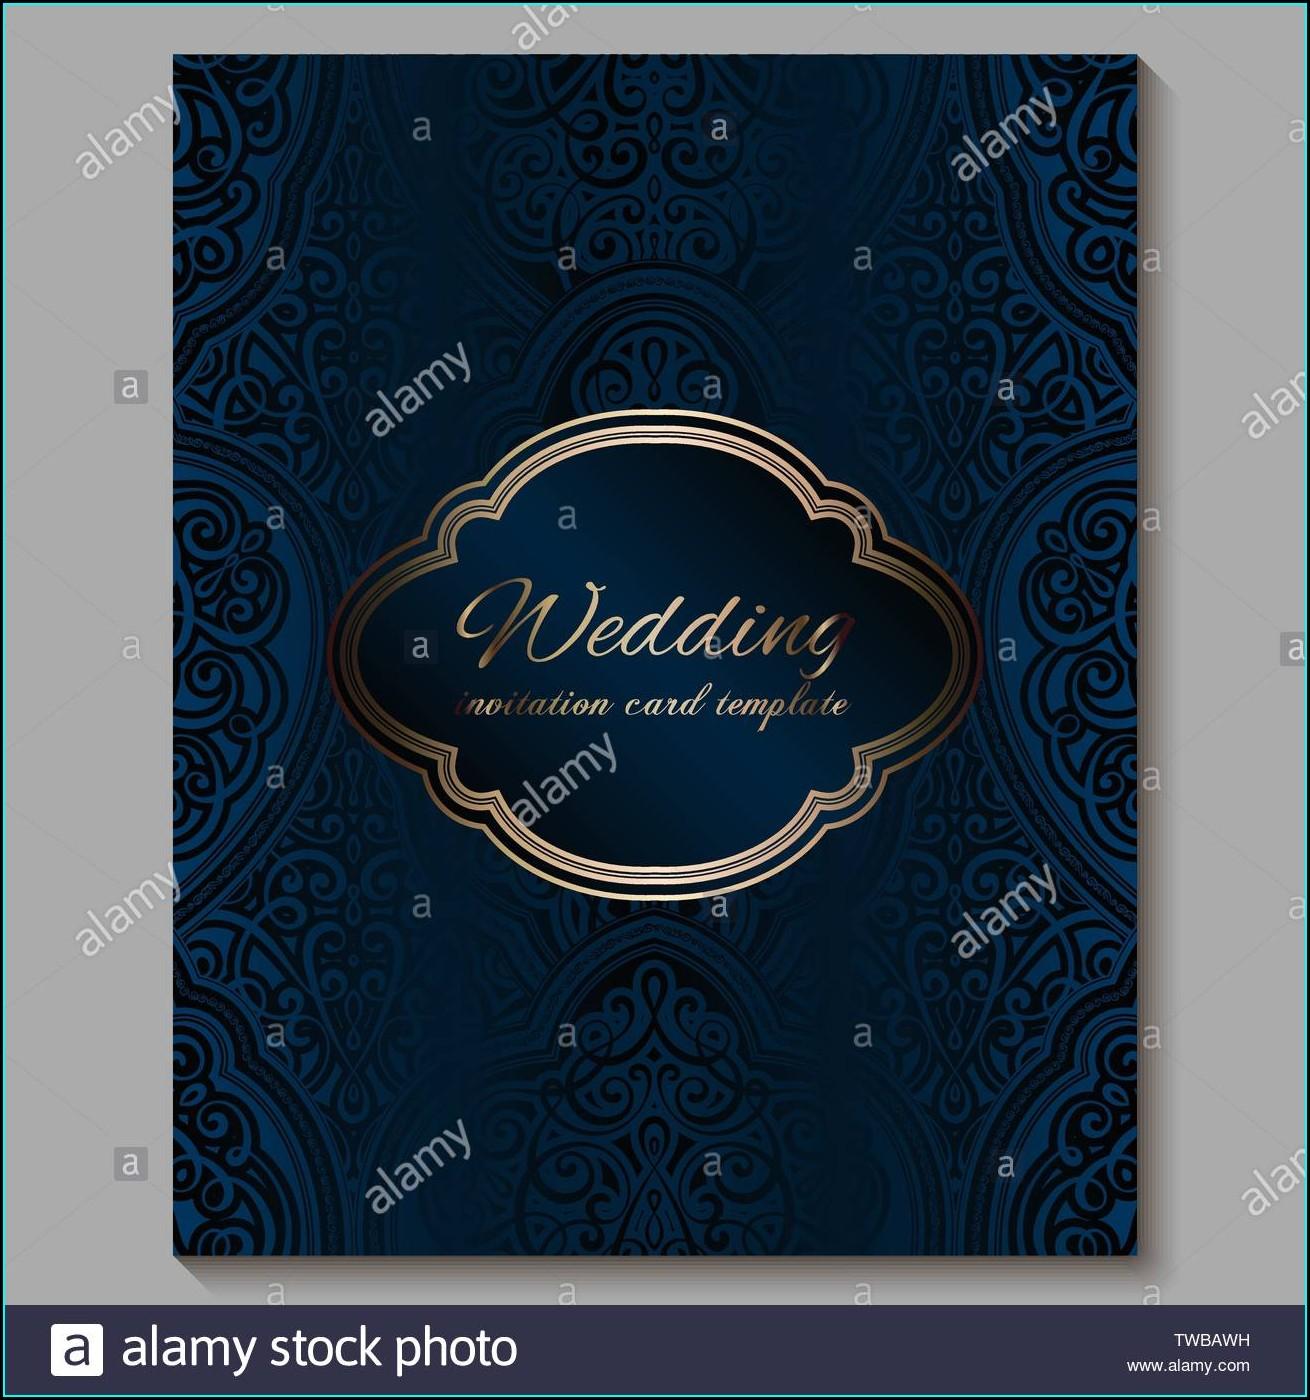 Wedding Invitation Card Royal Blue Background Design